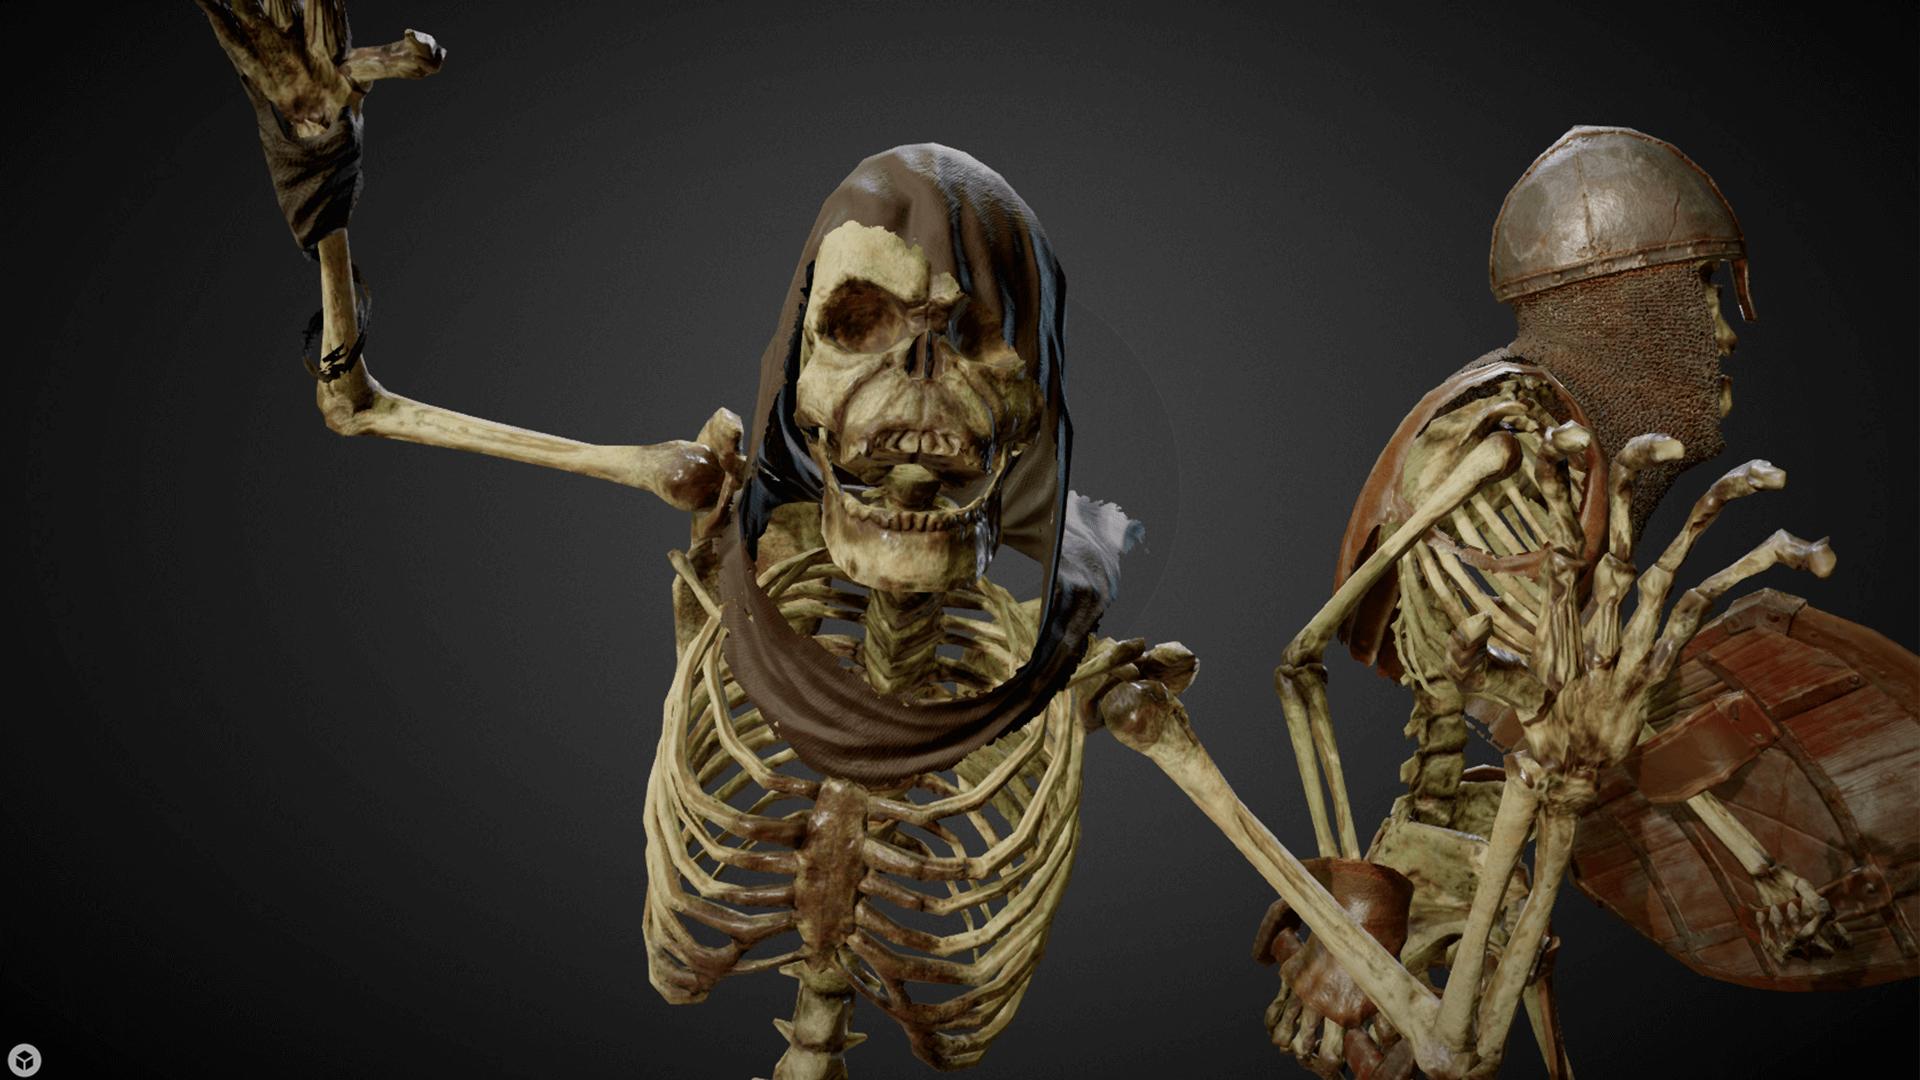 An Angheuol Story: The First Hunt - Page 5 SkeletonCharacterPack_Screenshot_05-1920x1080-d8b681c4e335b4ce578323f9f2637b5d